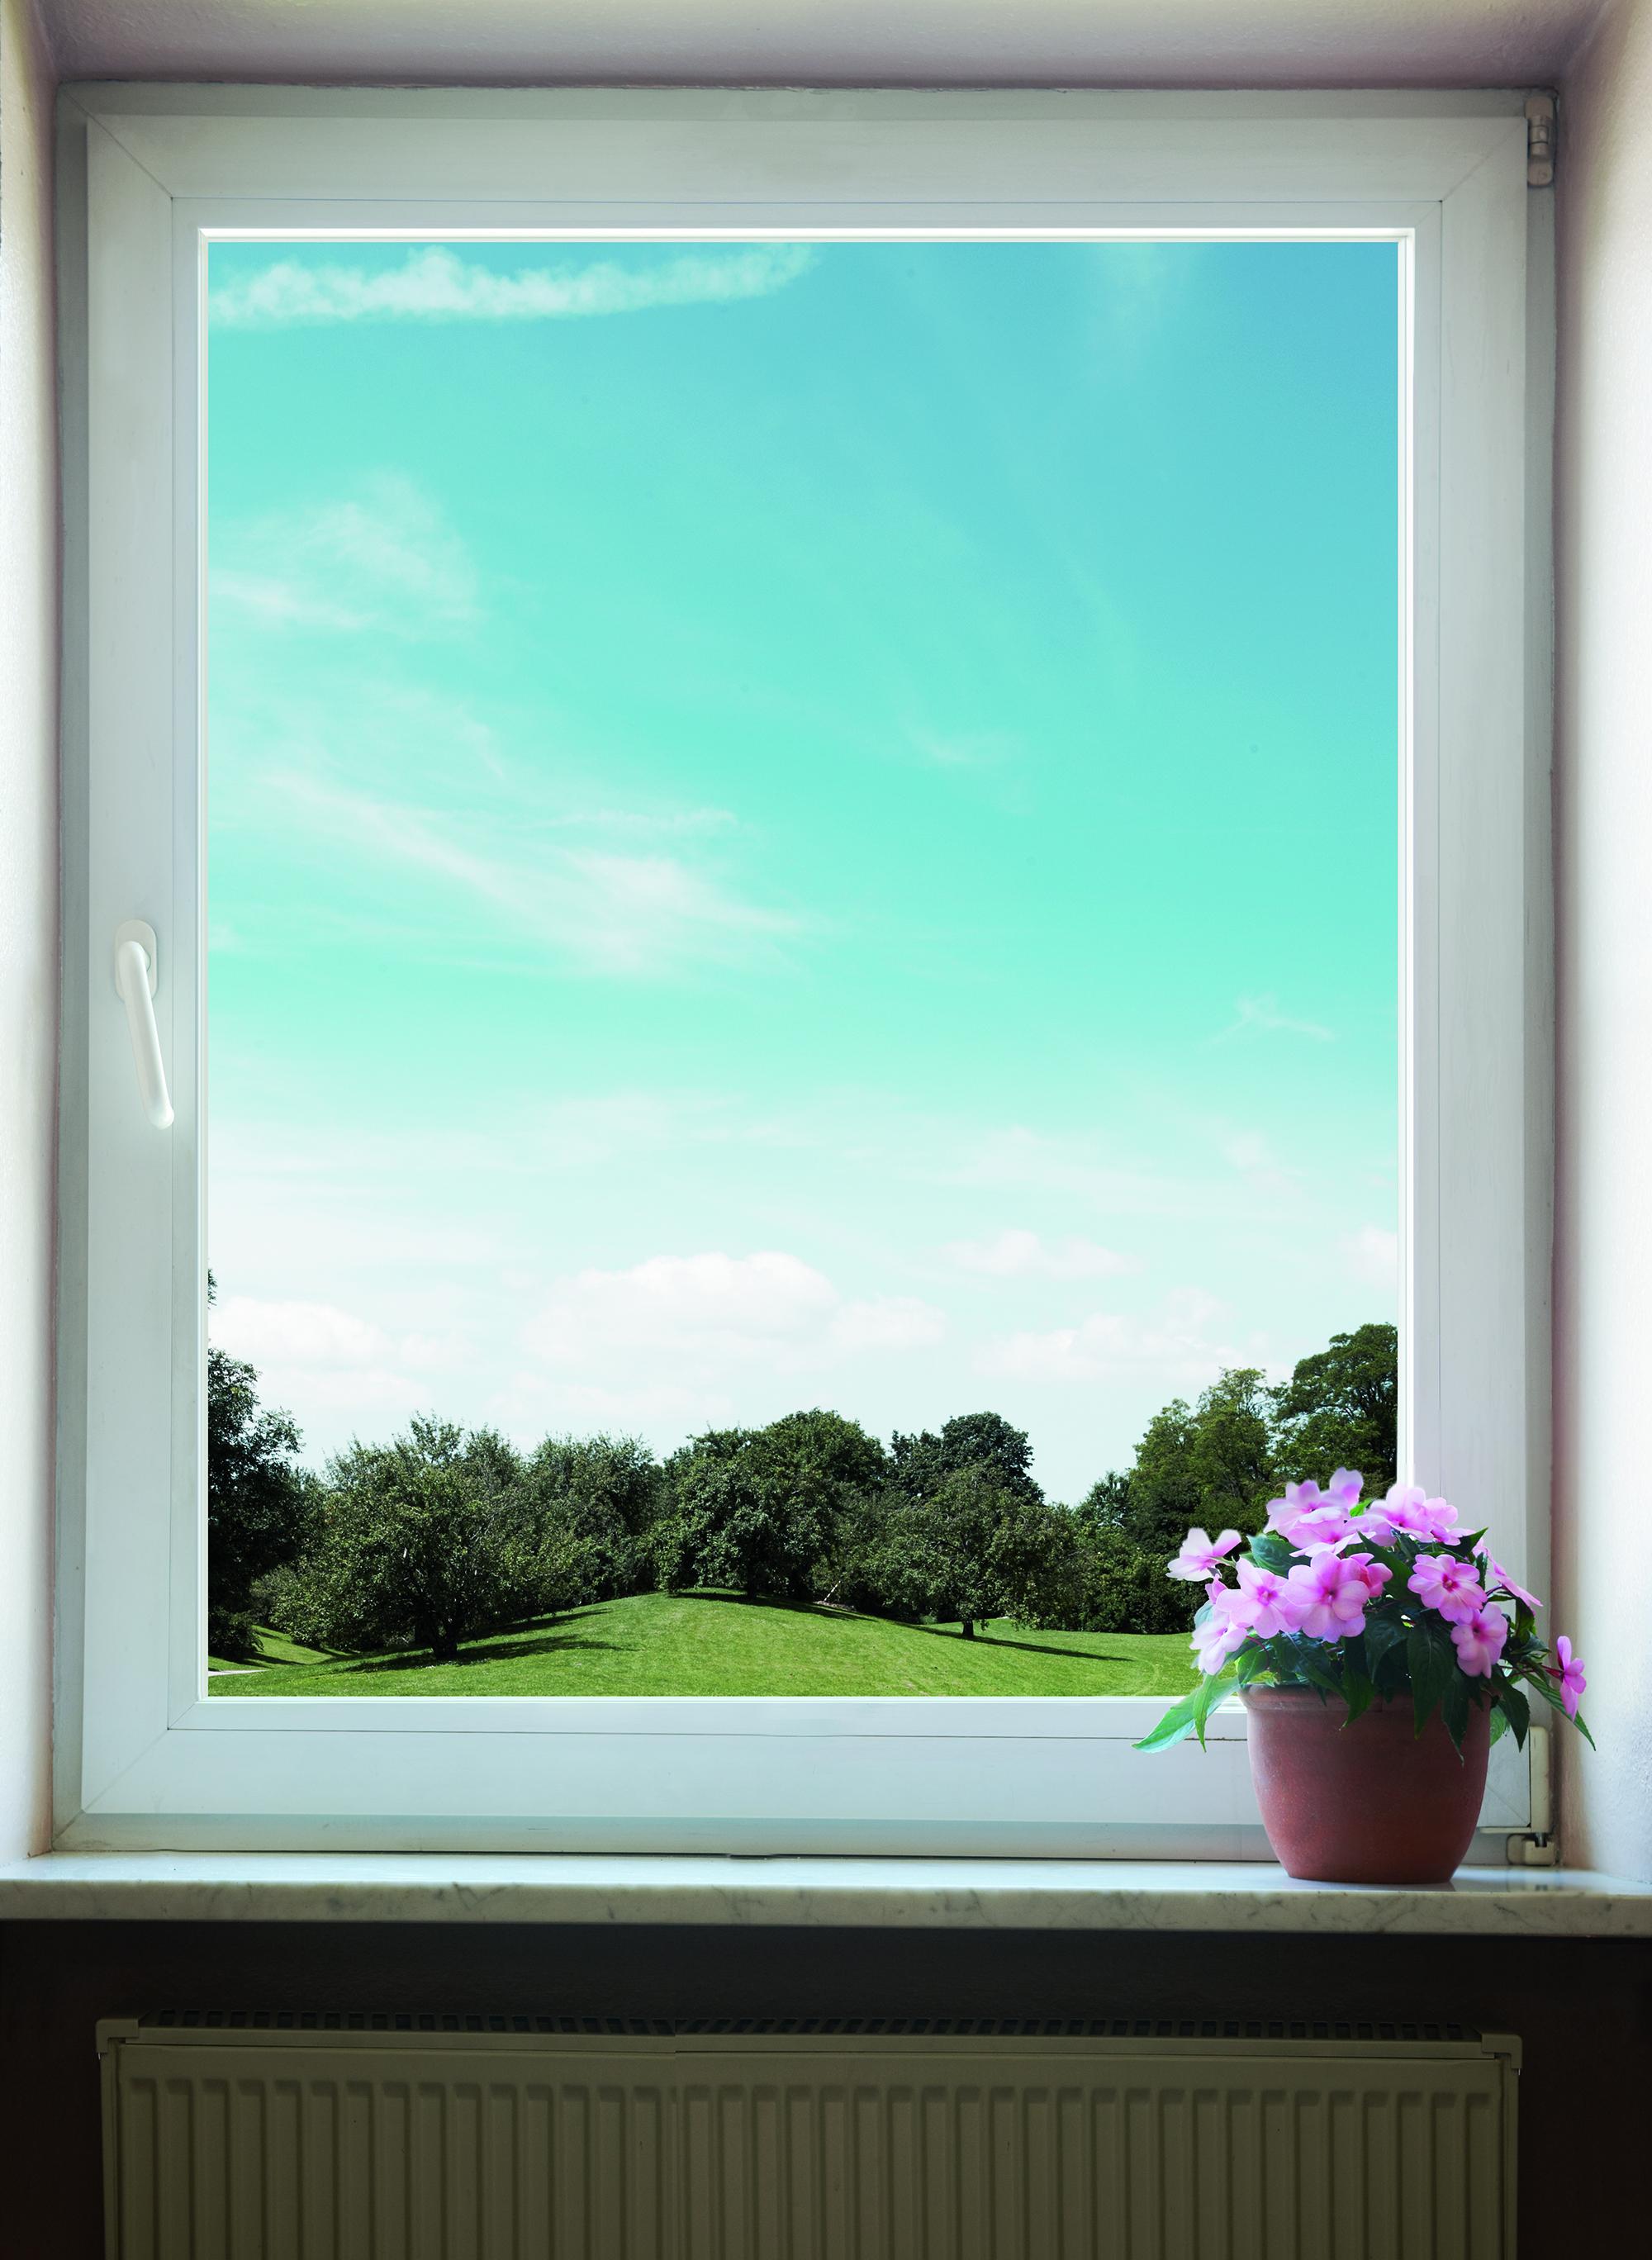 Blick aus dem Fenster ins Grüne.